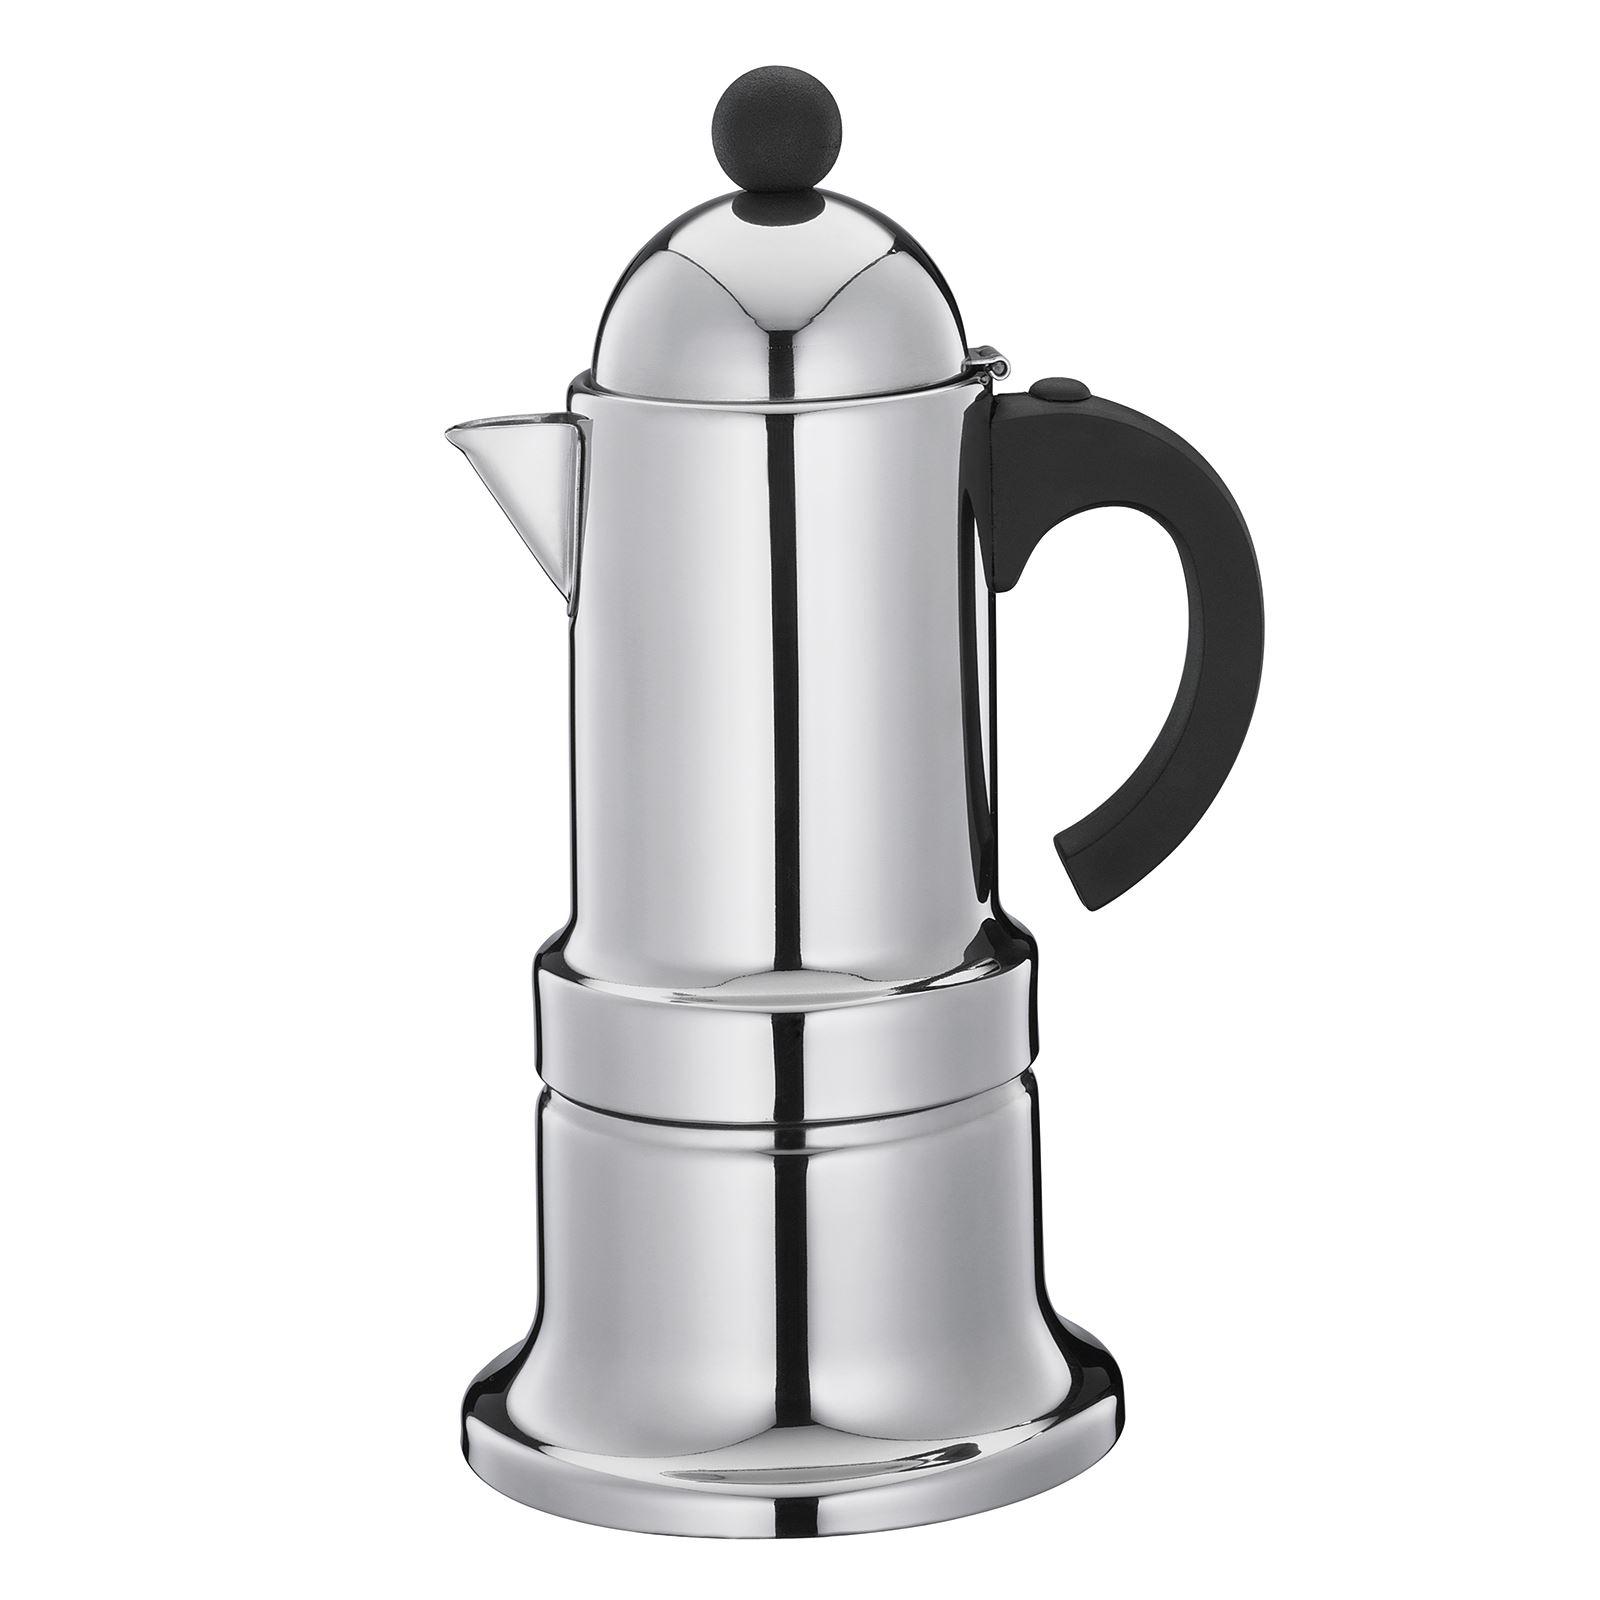 cilio espressokocher kontessa f r 6 tassen edelstahl induktion 4017166140415 ebay. Black Bedroom Furniture Sets. Home Design Ideas